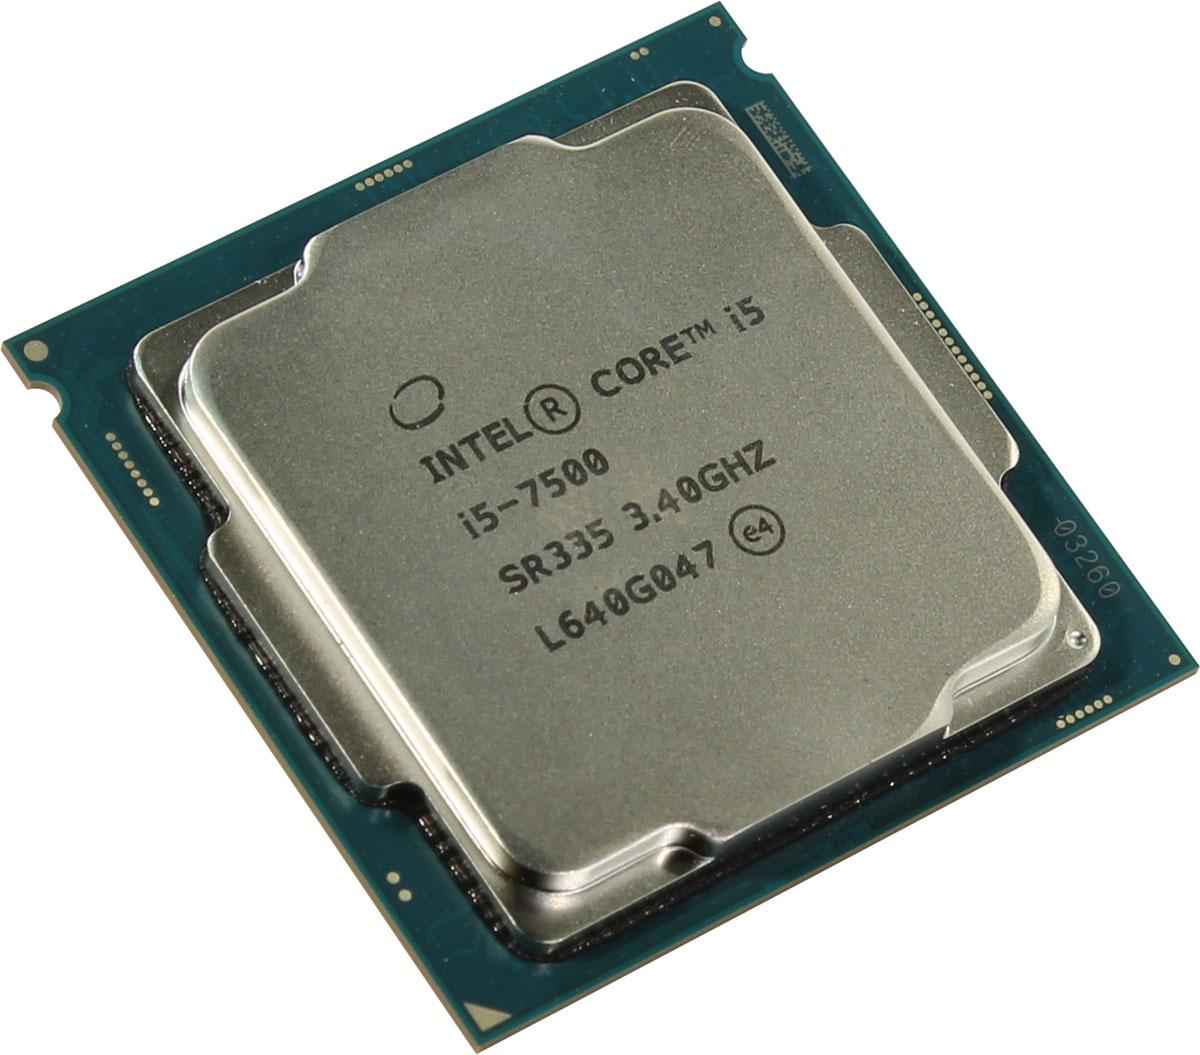 Intel Core i5-7500 процессор процессор для пк intel i5 2450m sr0ch 2 5g 3m pga